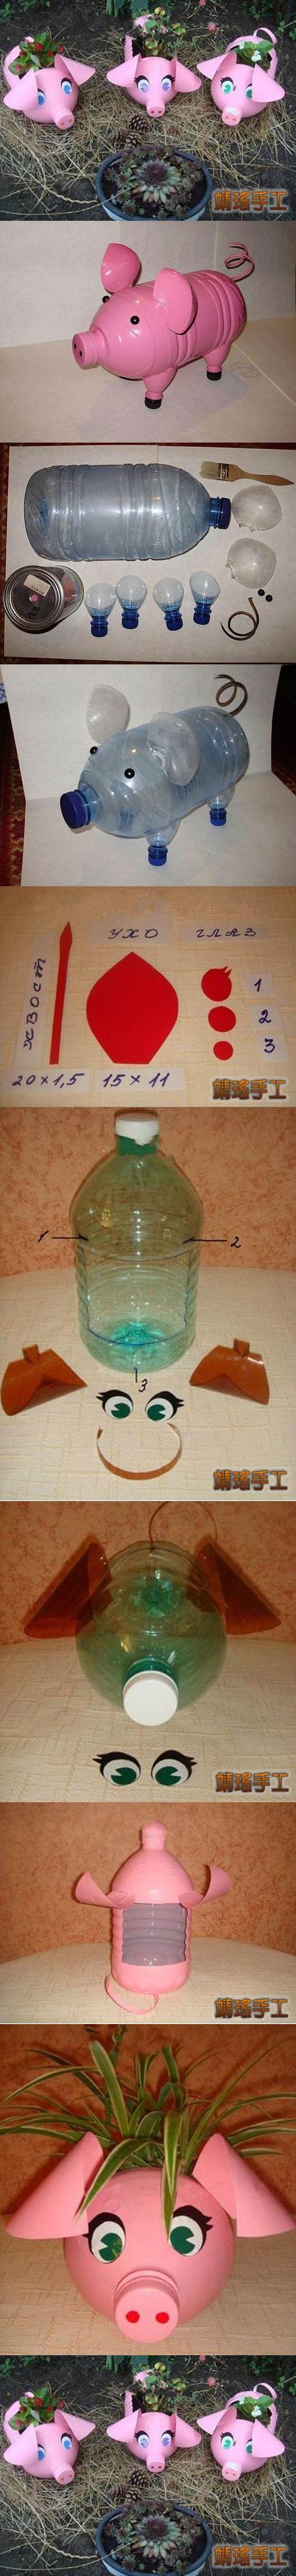 Wonderful DIY Piglet Planter from Plastic Bottles | WonderfulDIY.com